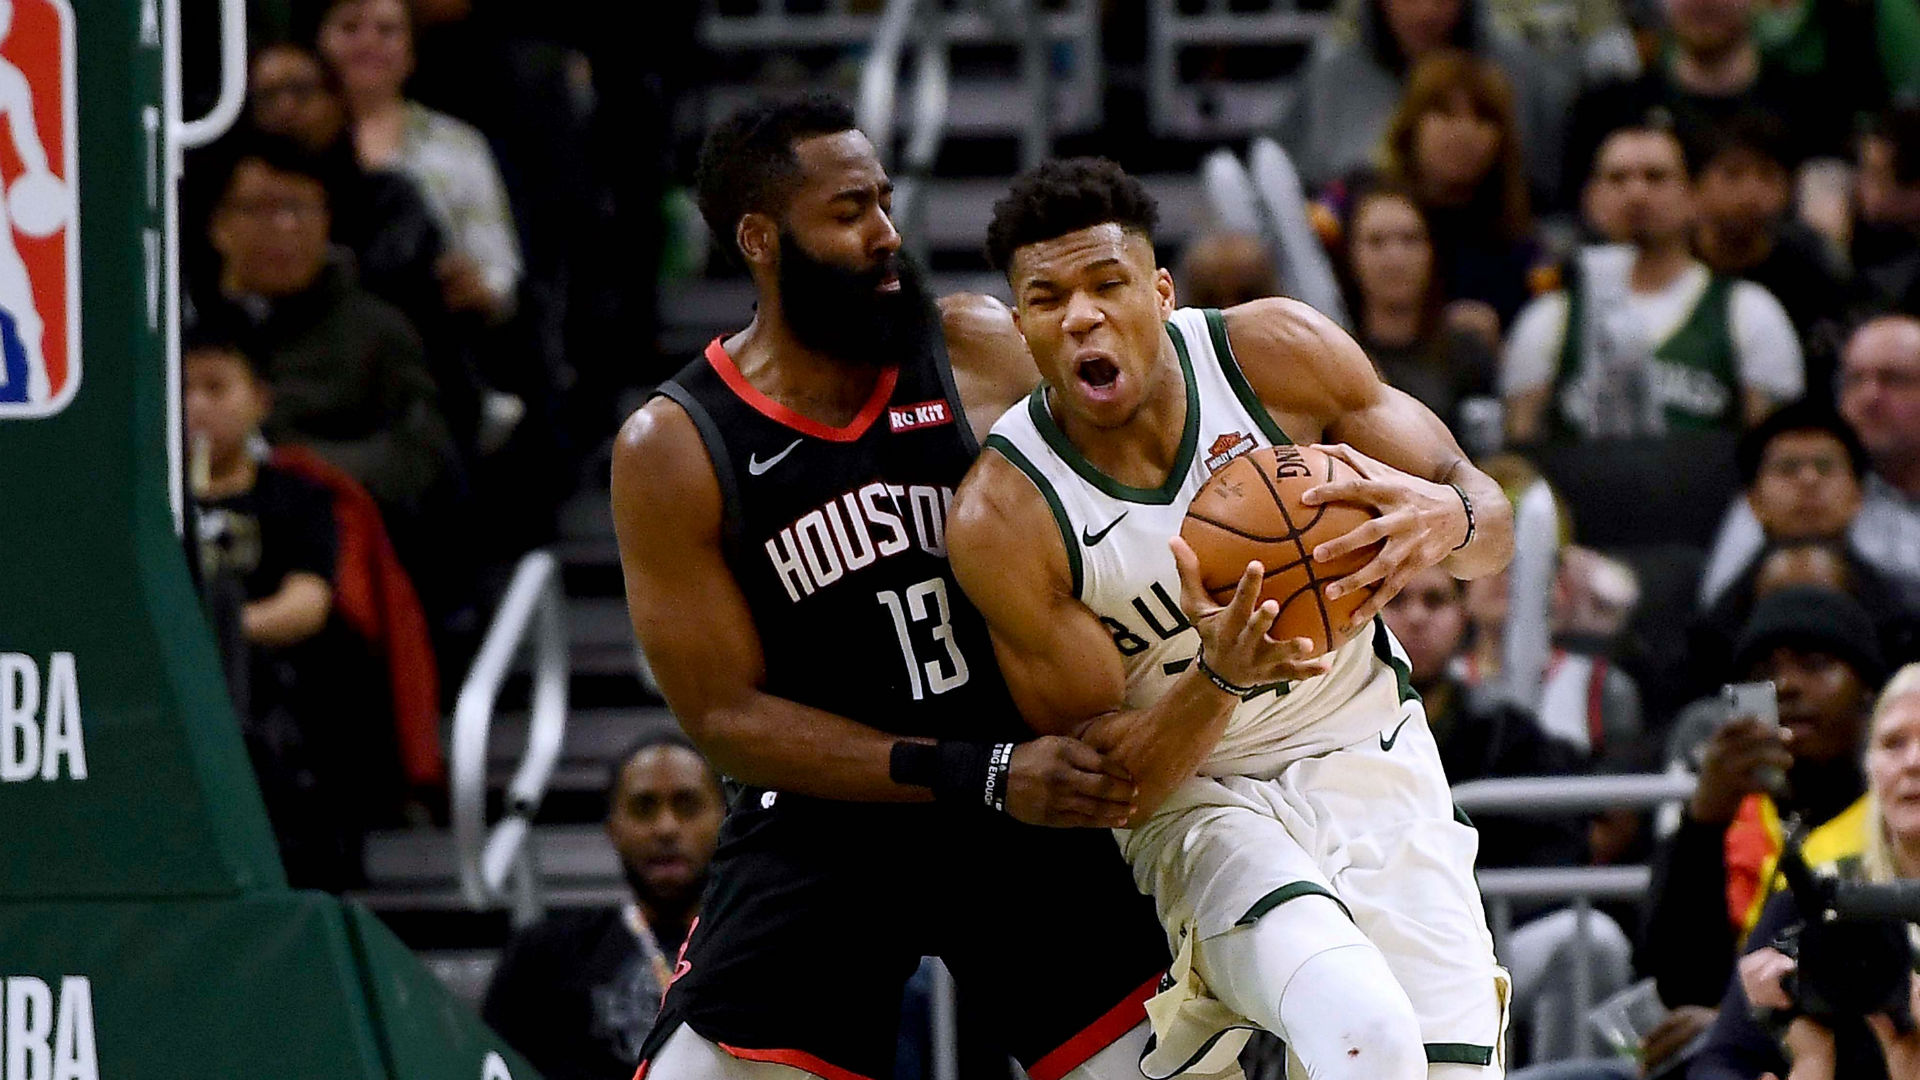 The narrative established around Milwaukee Bucks star Giannis Antetokounmpo by the media won him MVP honours, says James Harden.